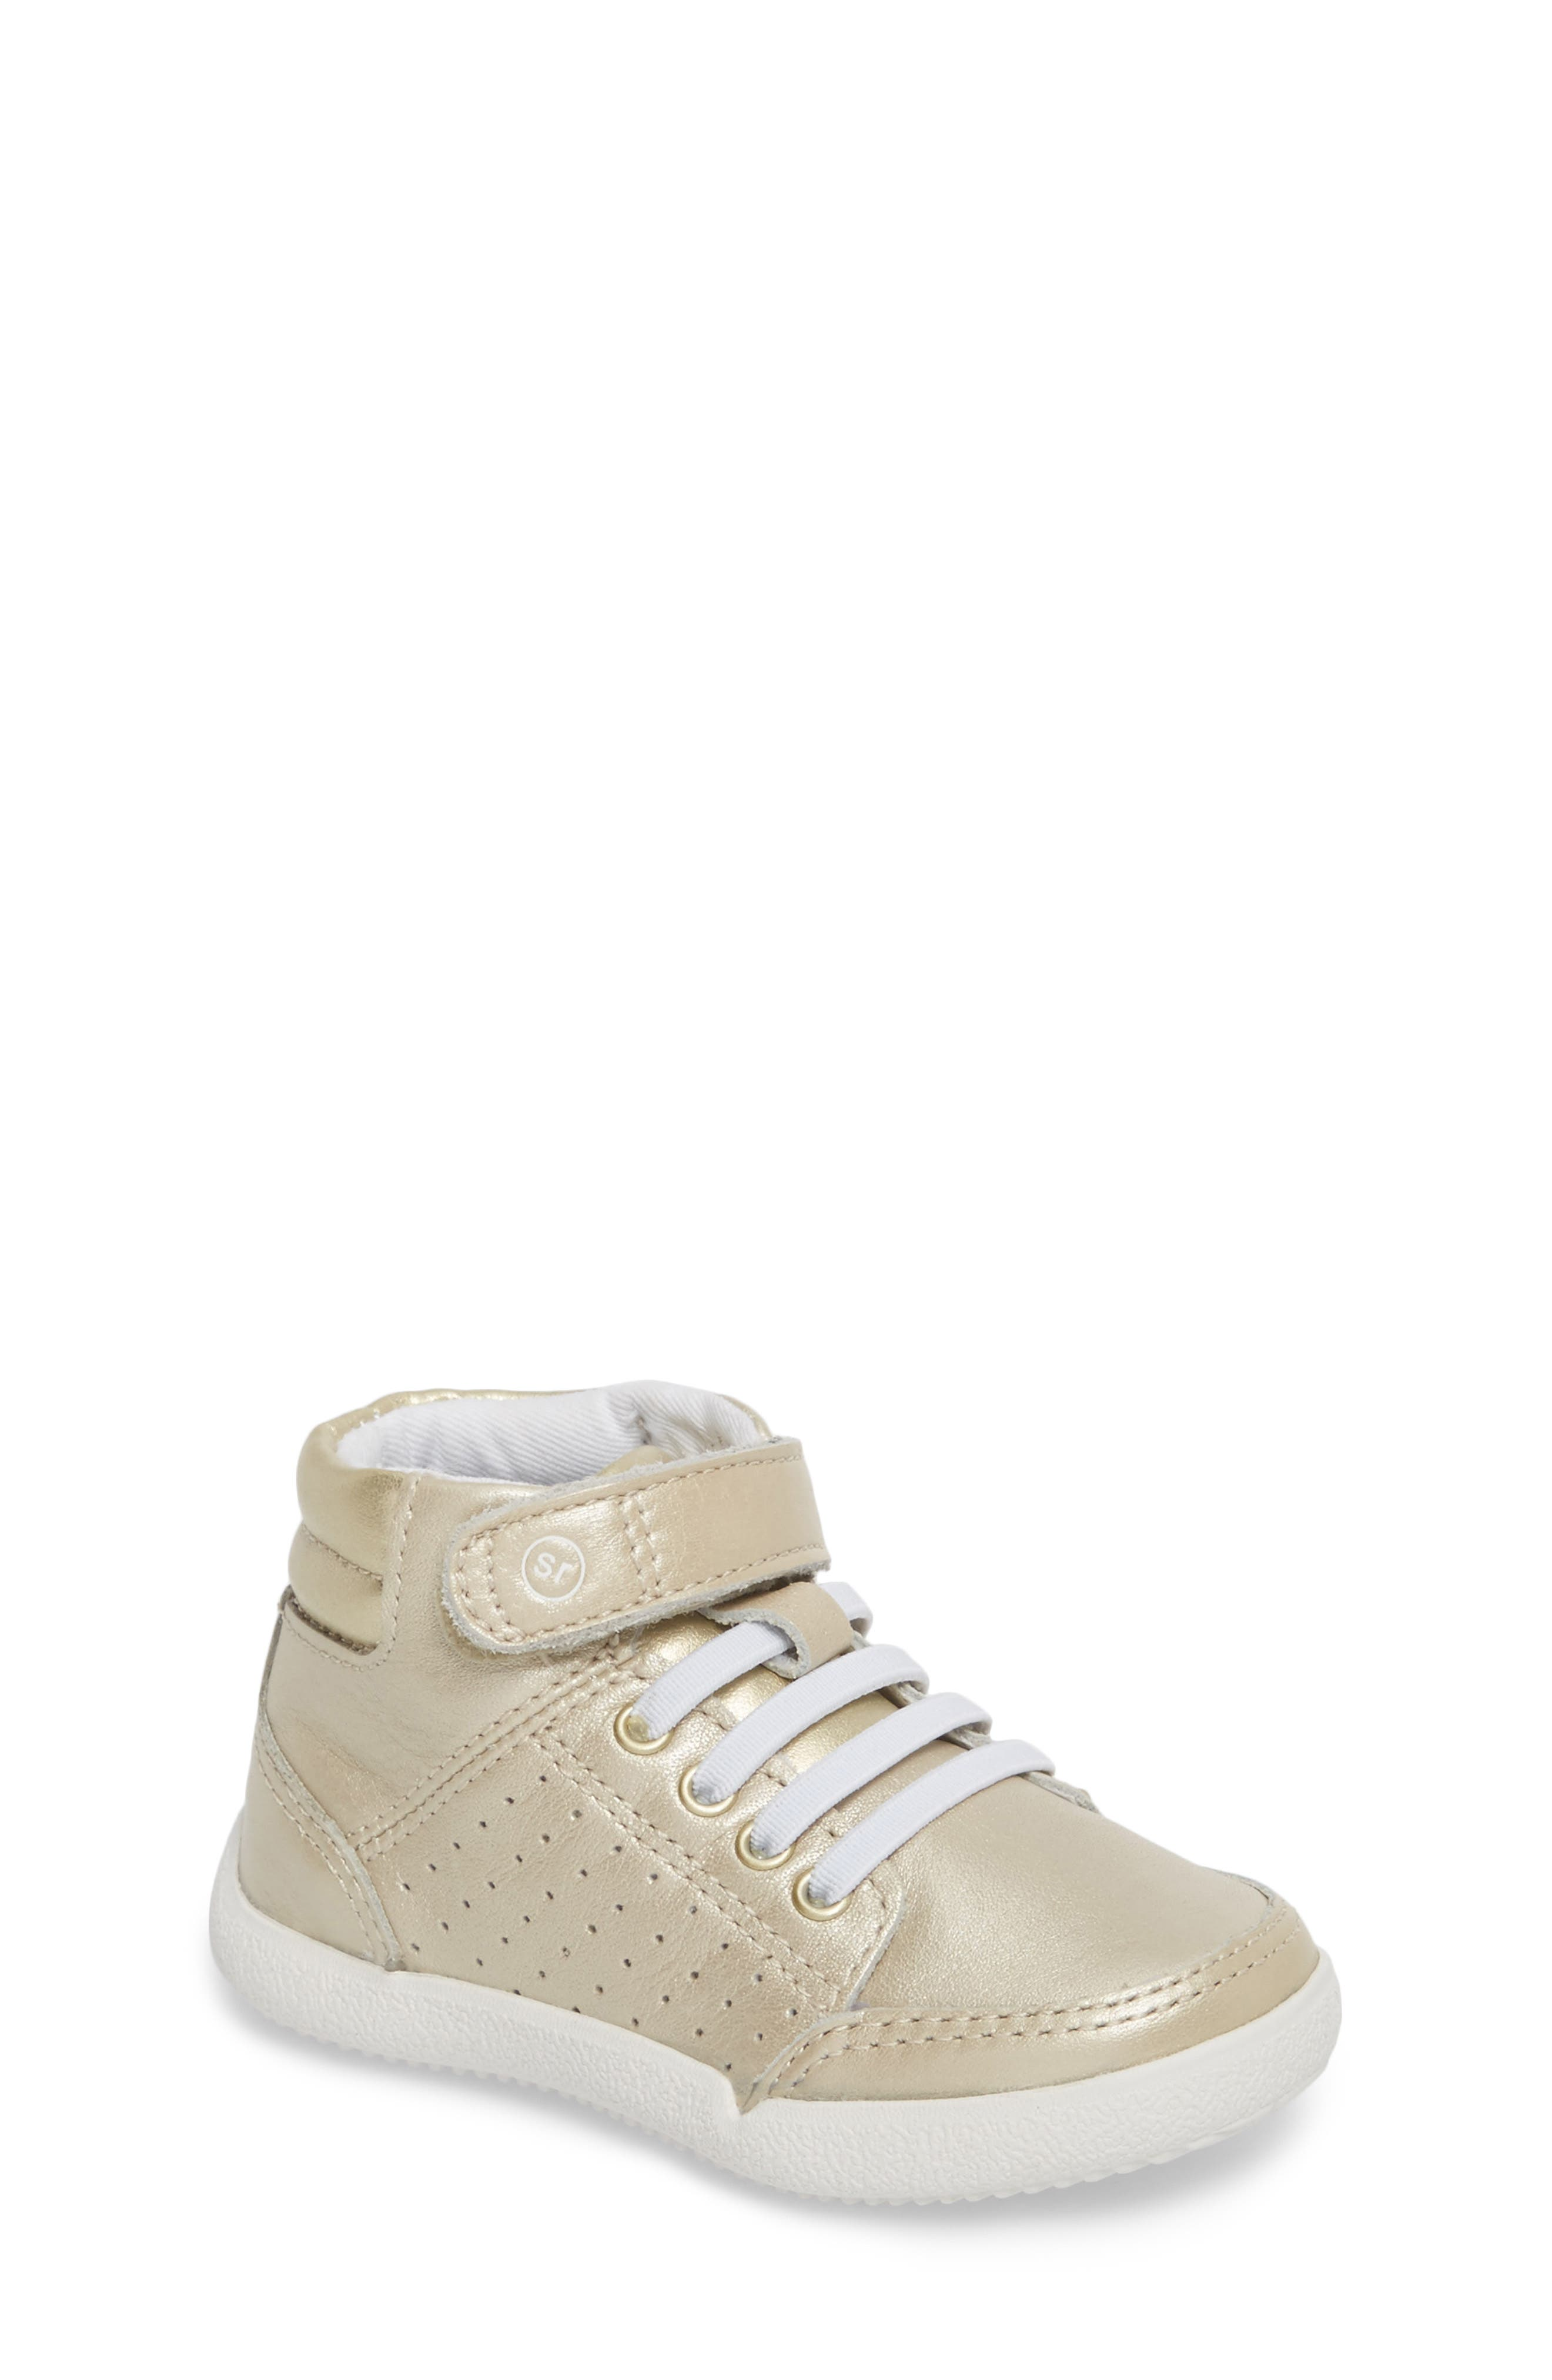 Alternate Image 1 Selected - Stride Rite Stone High Top Sneaker (Baby, Walker & Toddler)